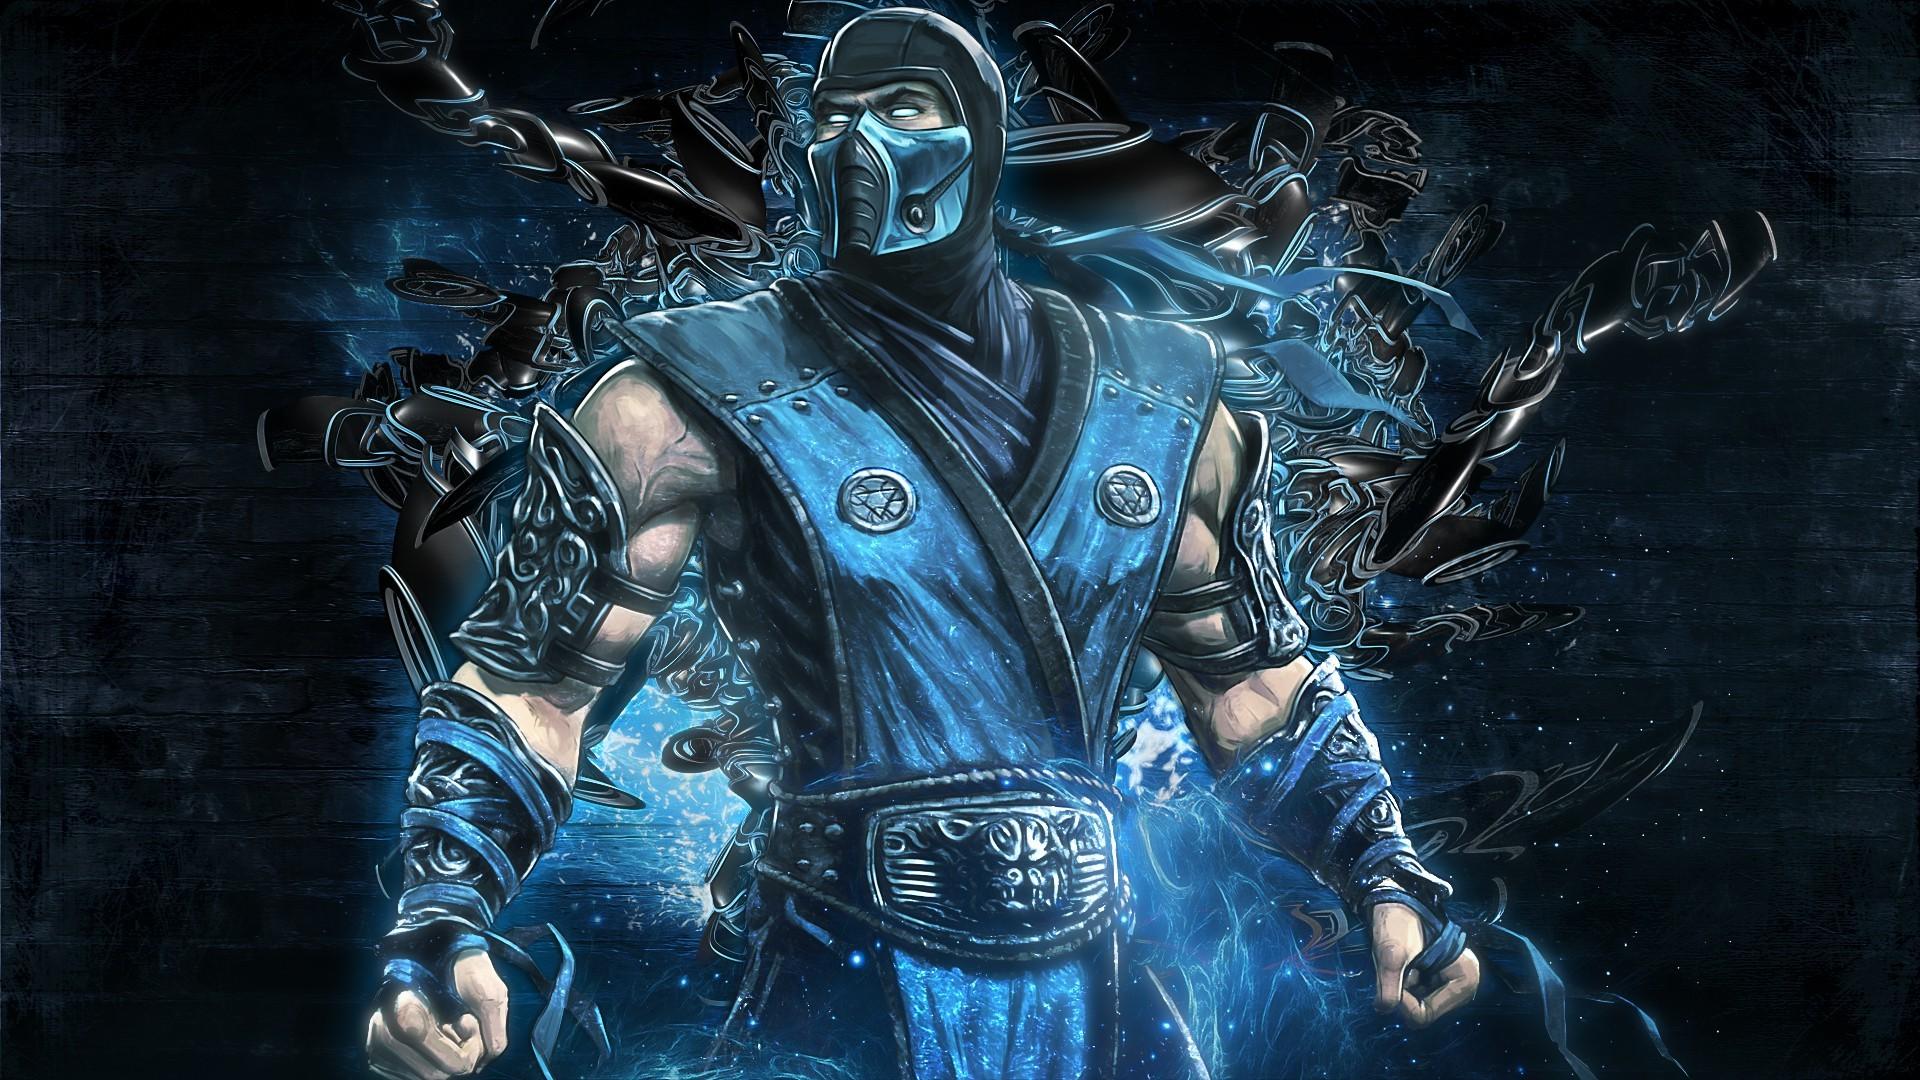 Wallpaper 1920x1080 Px Mortal Kombat Pc Gaming Sub Zero Video Games 1920x1080 Wallhaven 656565 Hd Wallpapers Wallhere